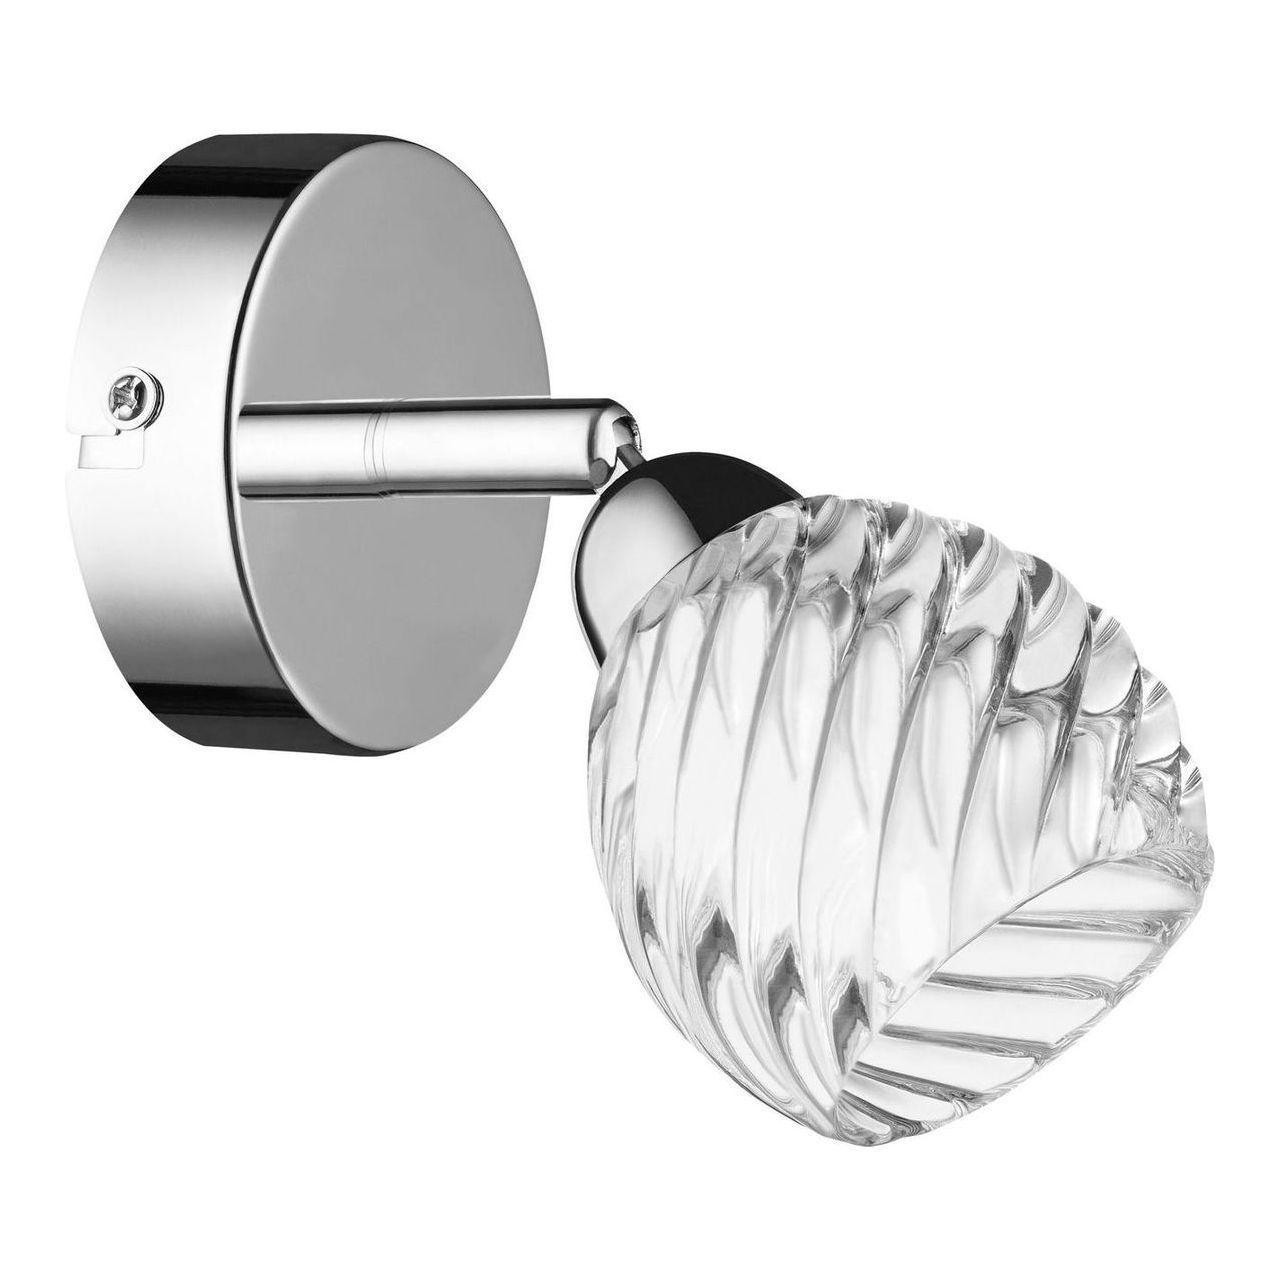 Светильник Britop Britop Wave Chrome 2102128 от svetilnik-online